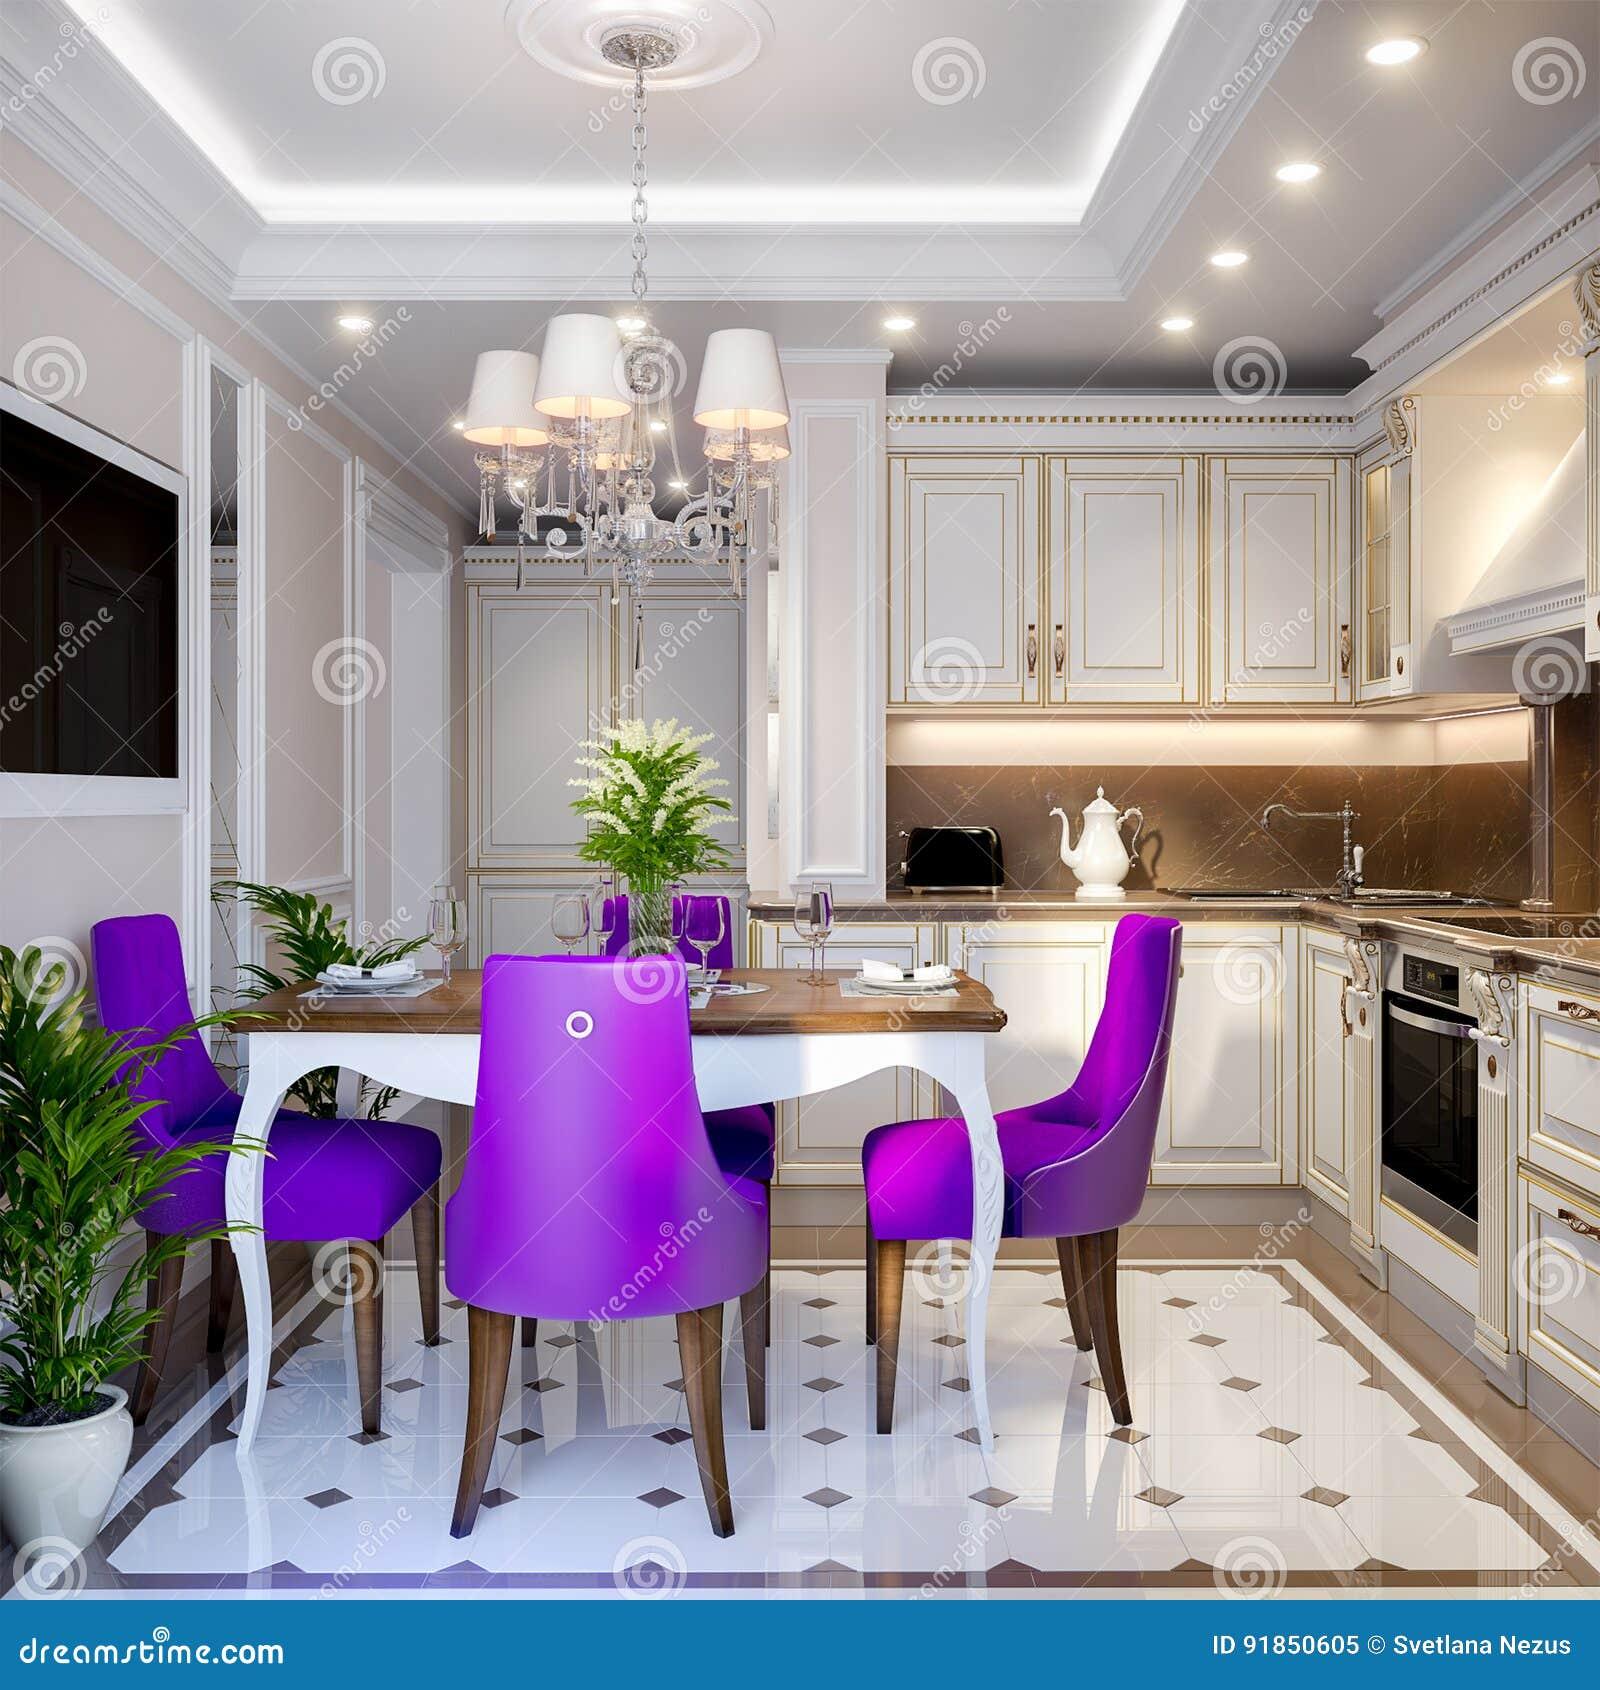 Kitchen Modern Classic: Elegant Modern Classic Kitchen Interior Design Stock